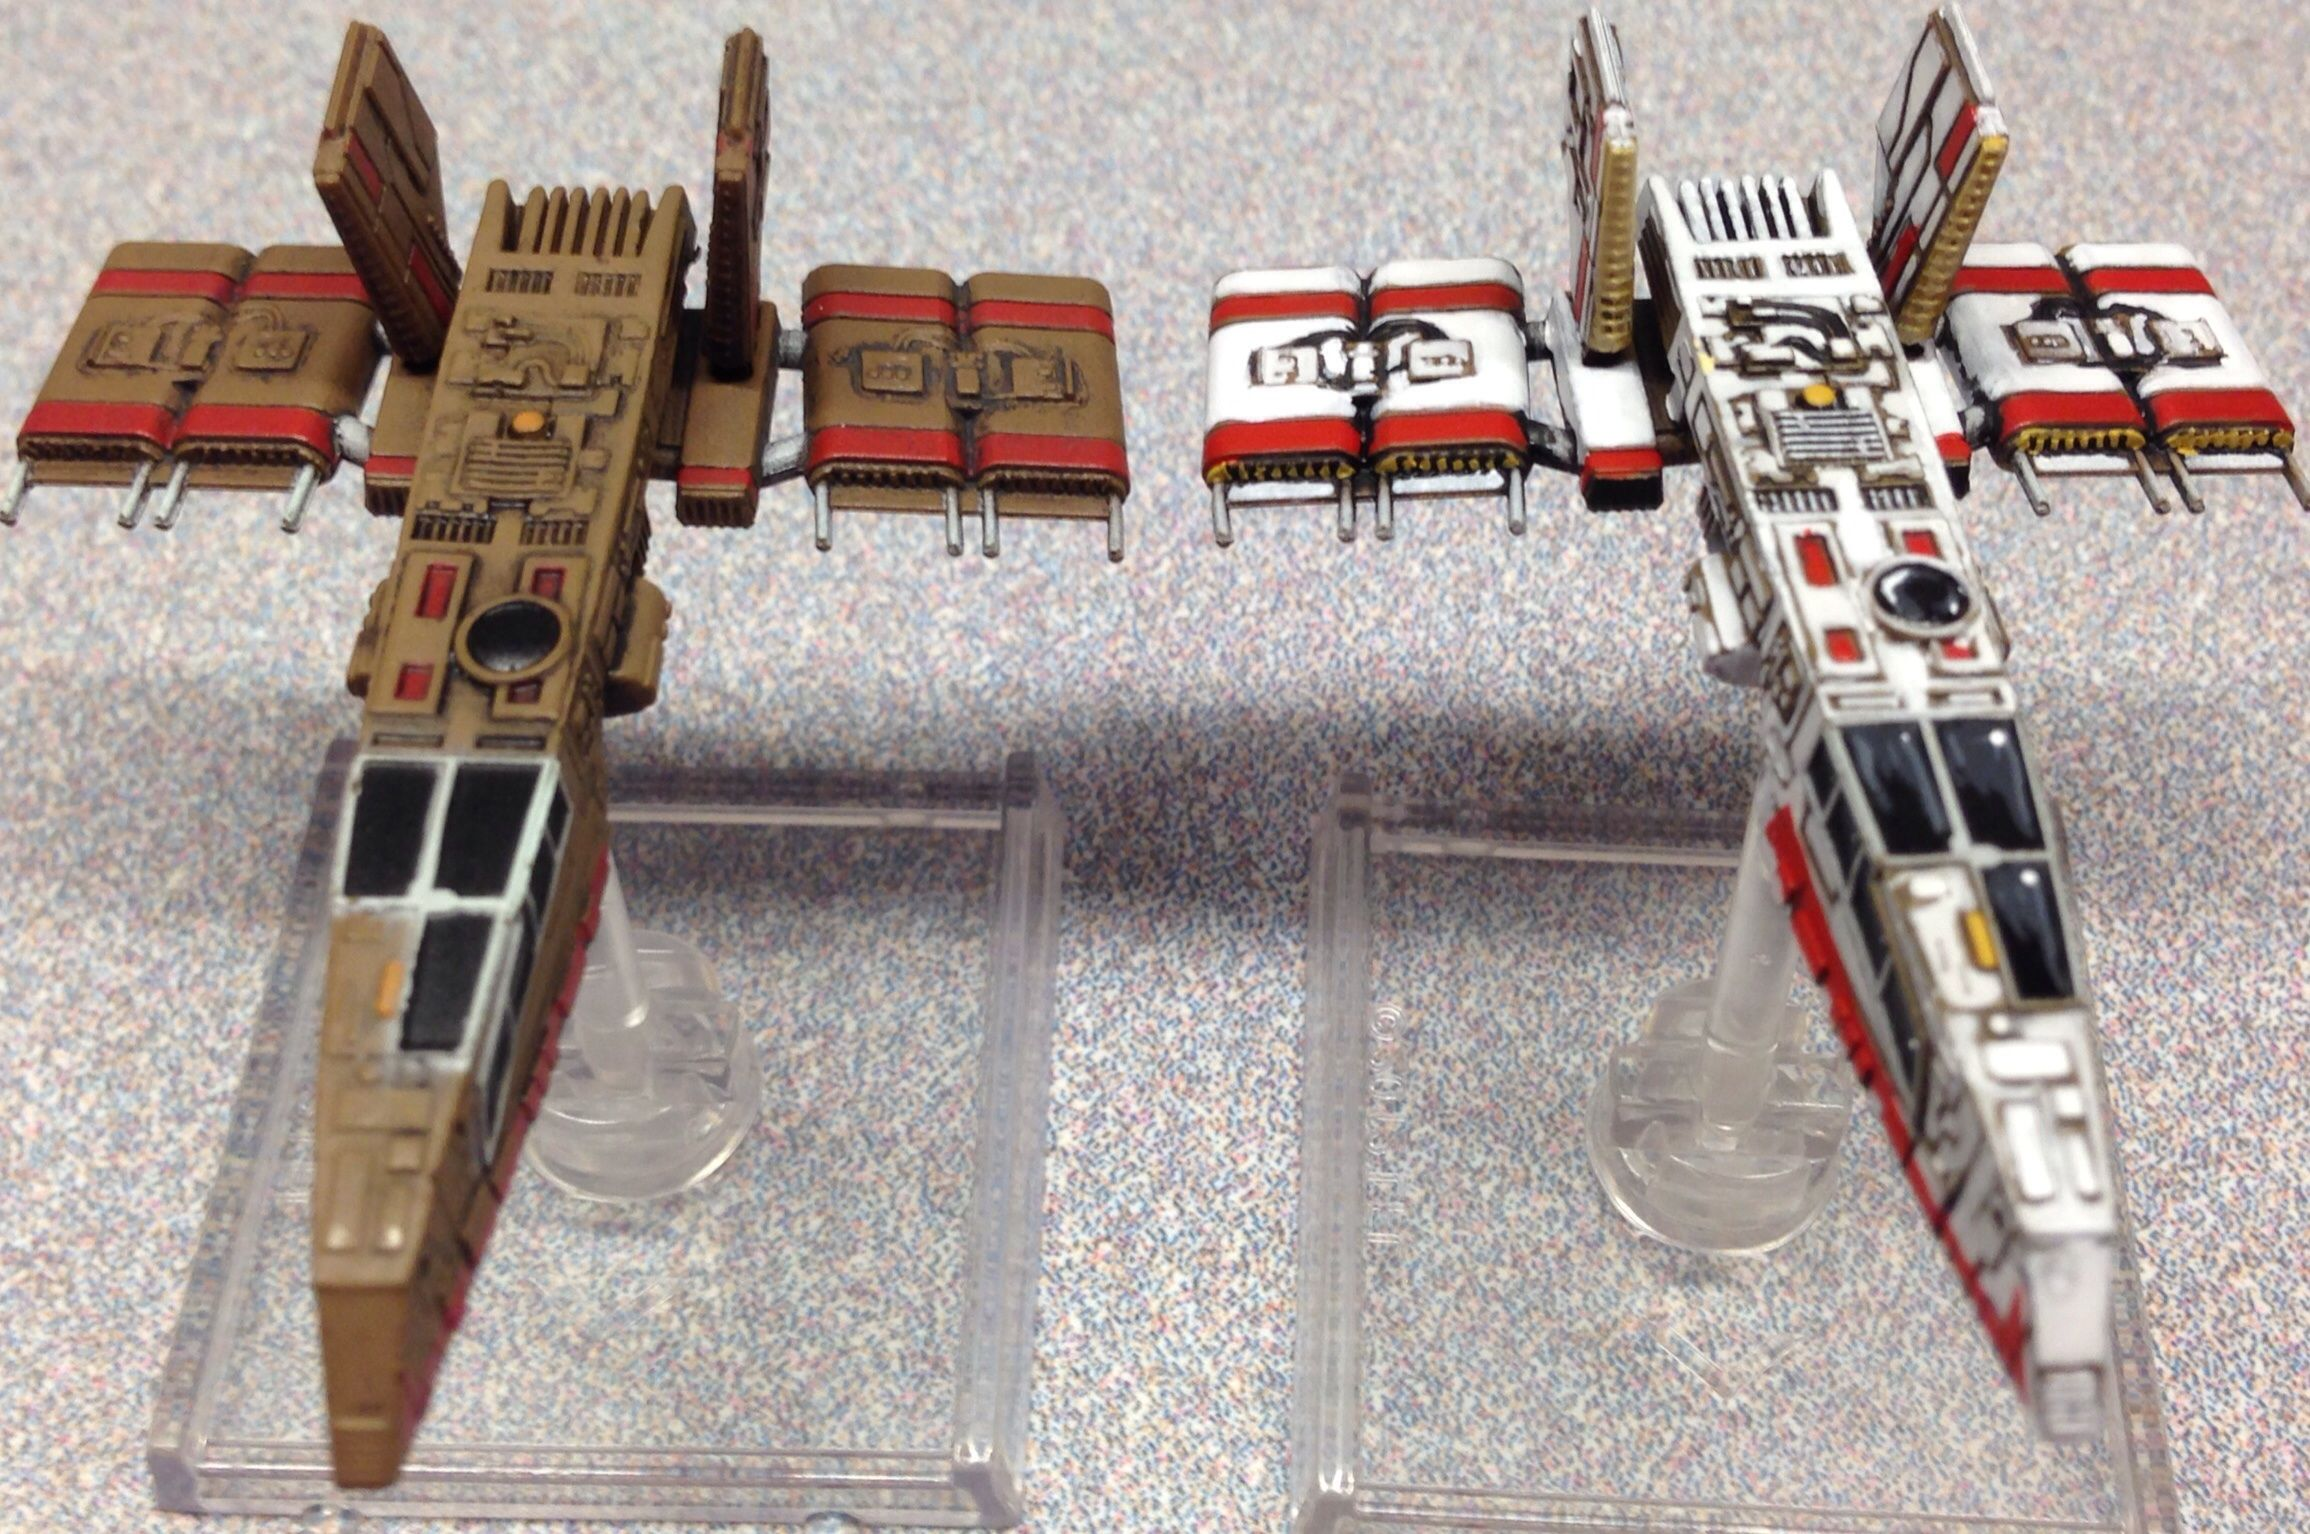 Hwk 290 Repaint X Wing Miniatures Star Wars Spaceships Star Wars Awesome